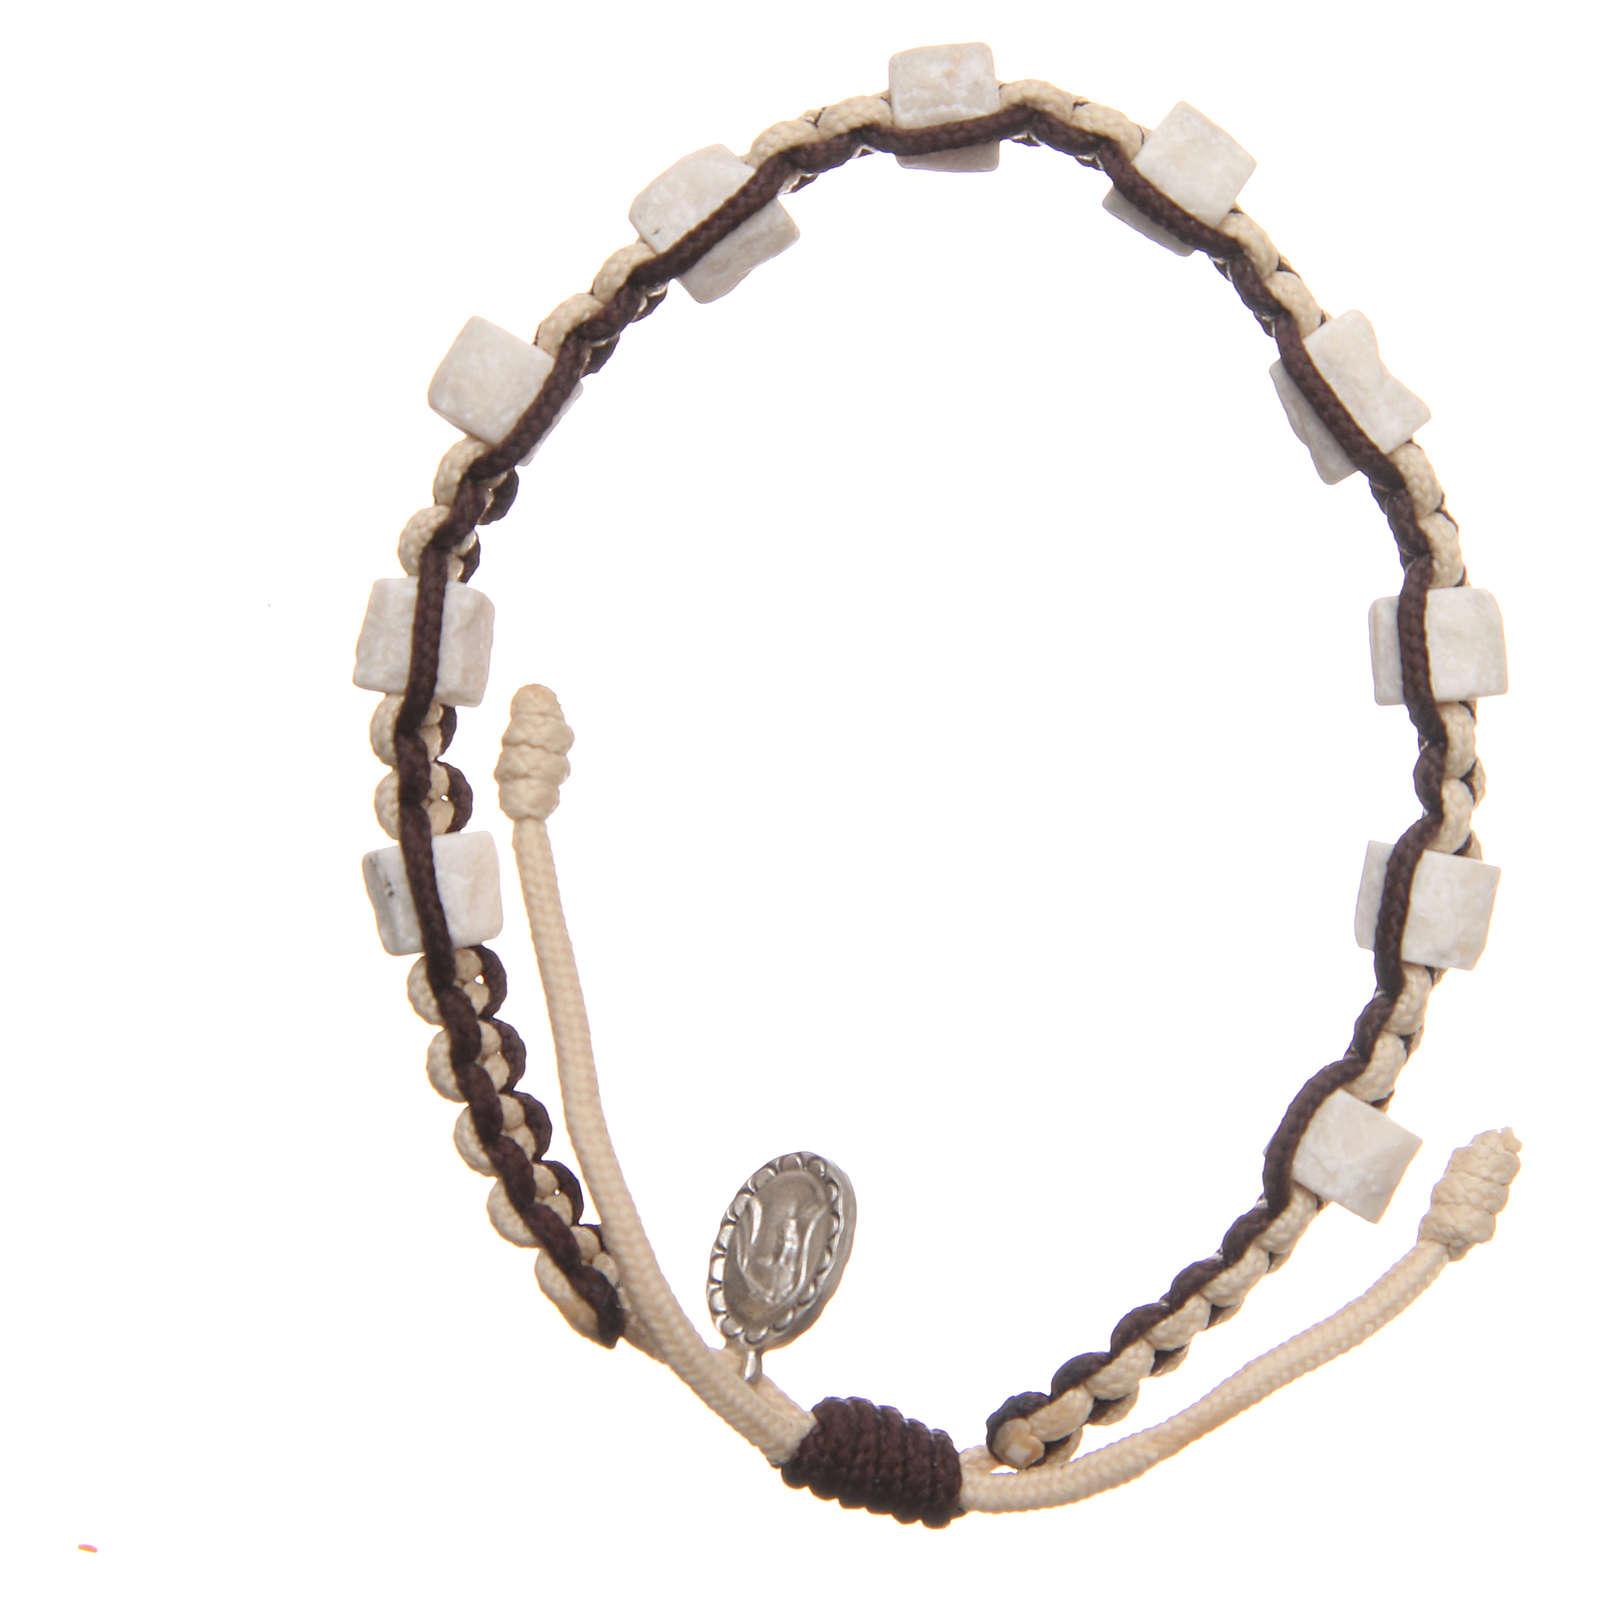 Bracciale decina Medjugorje pietra corda beige marrone 4